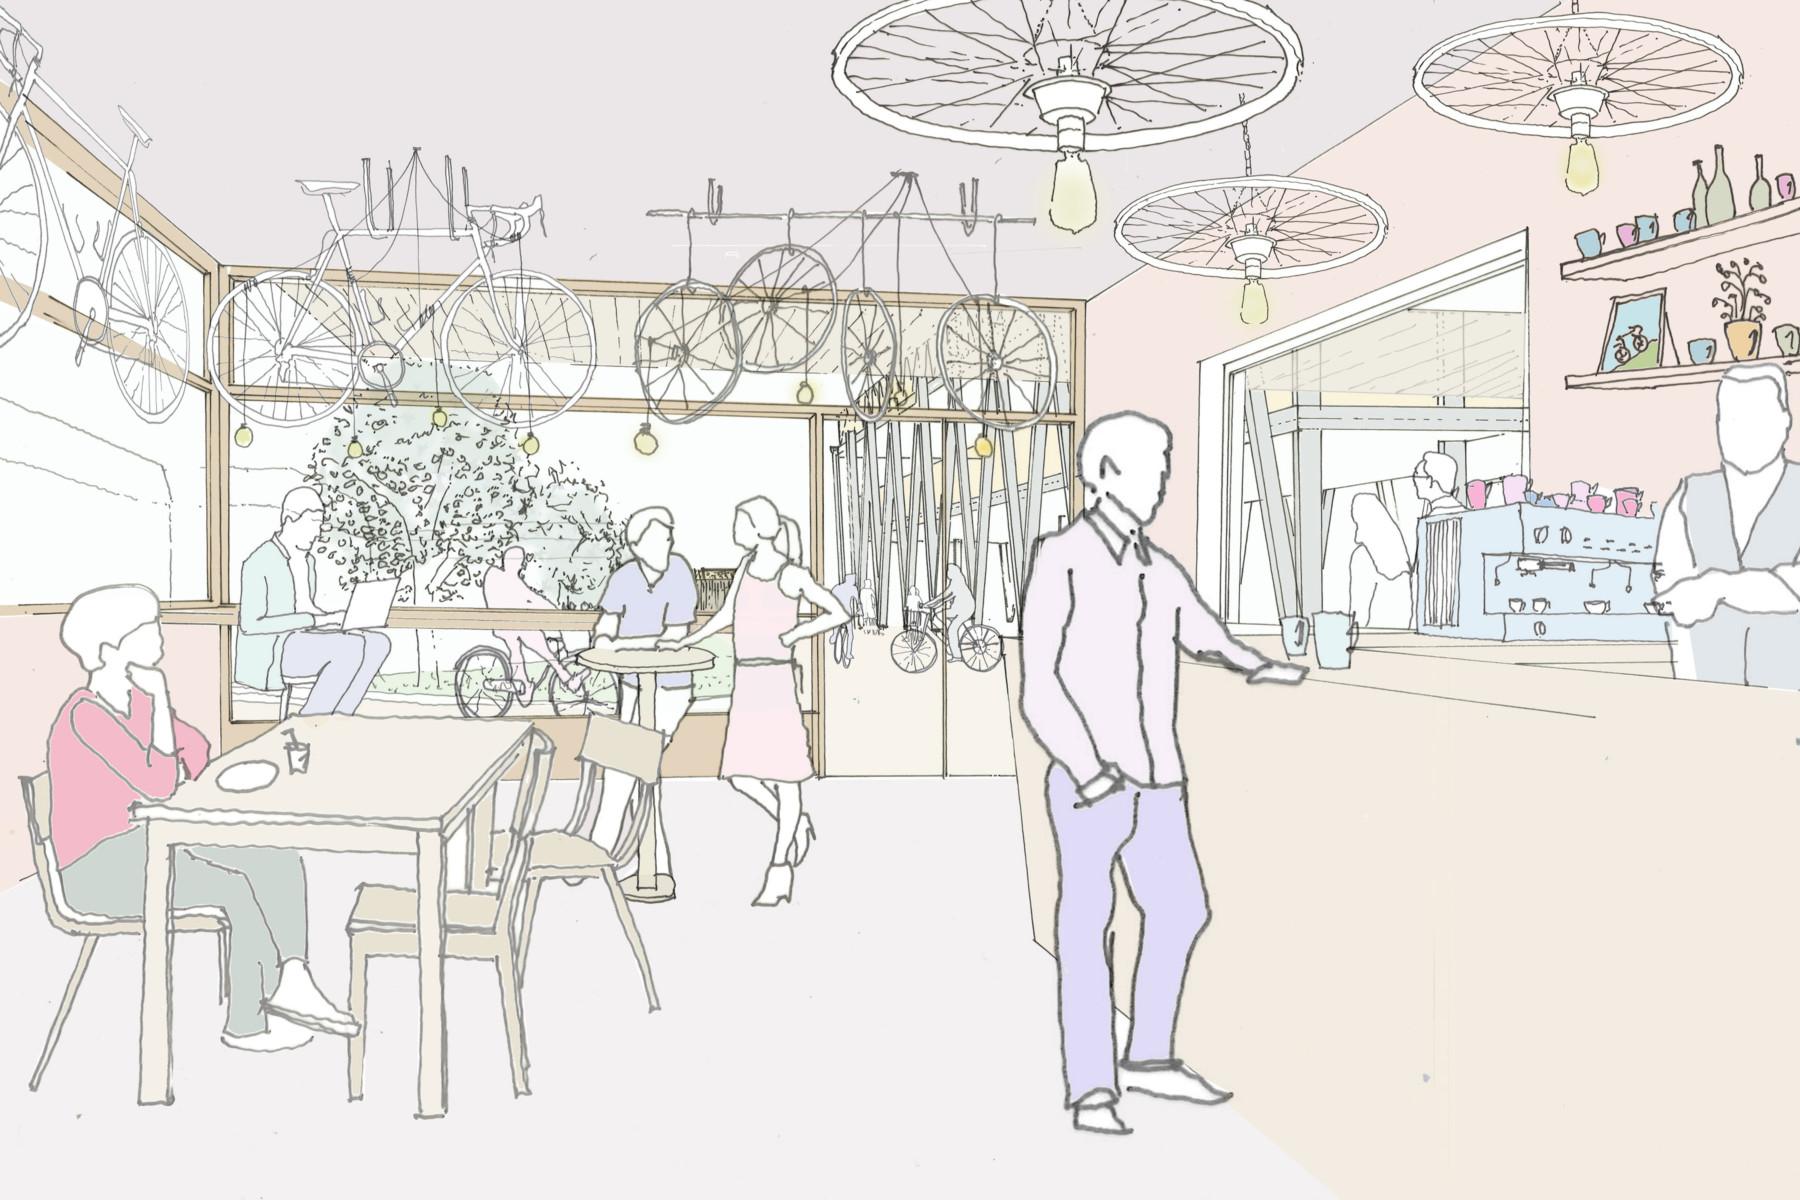 Sarah-Wigglesworth-Architects Kingston-Mini-Holland Hub 6 Perspective 3600